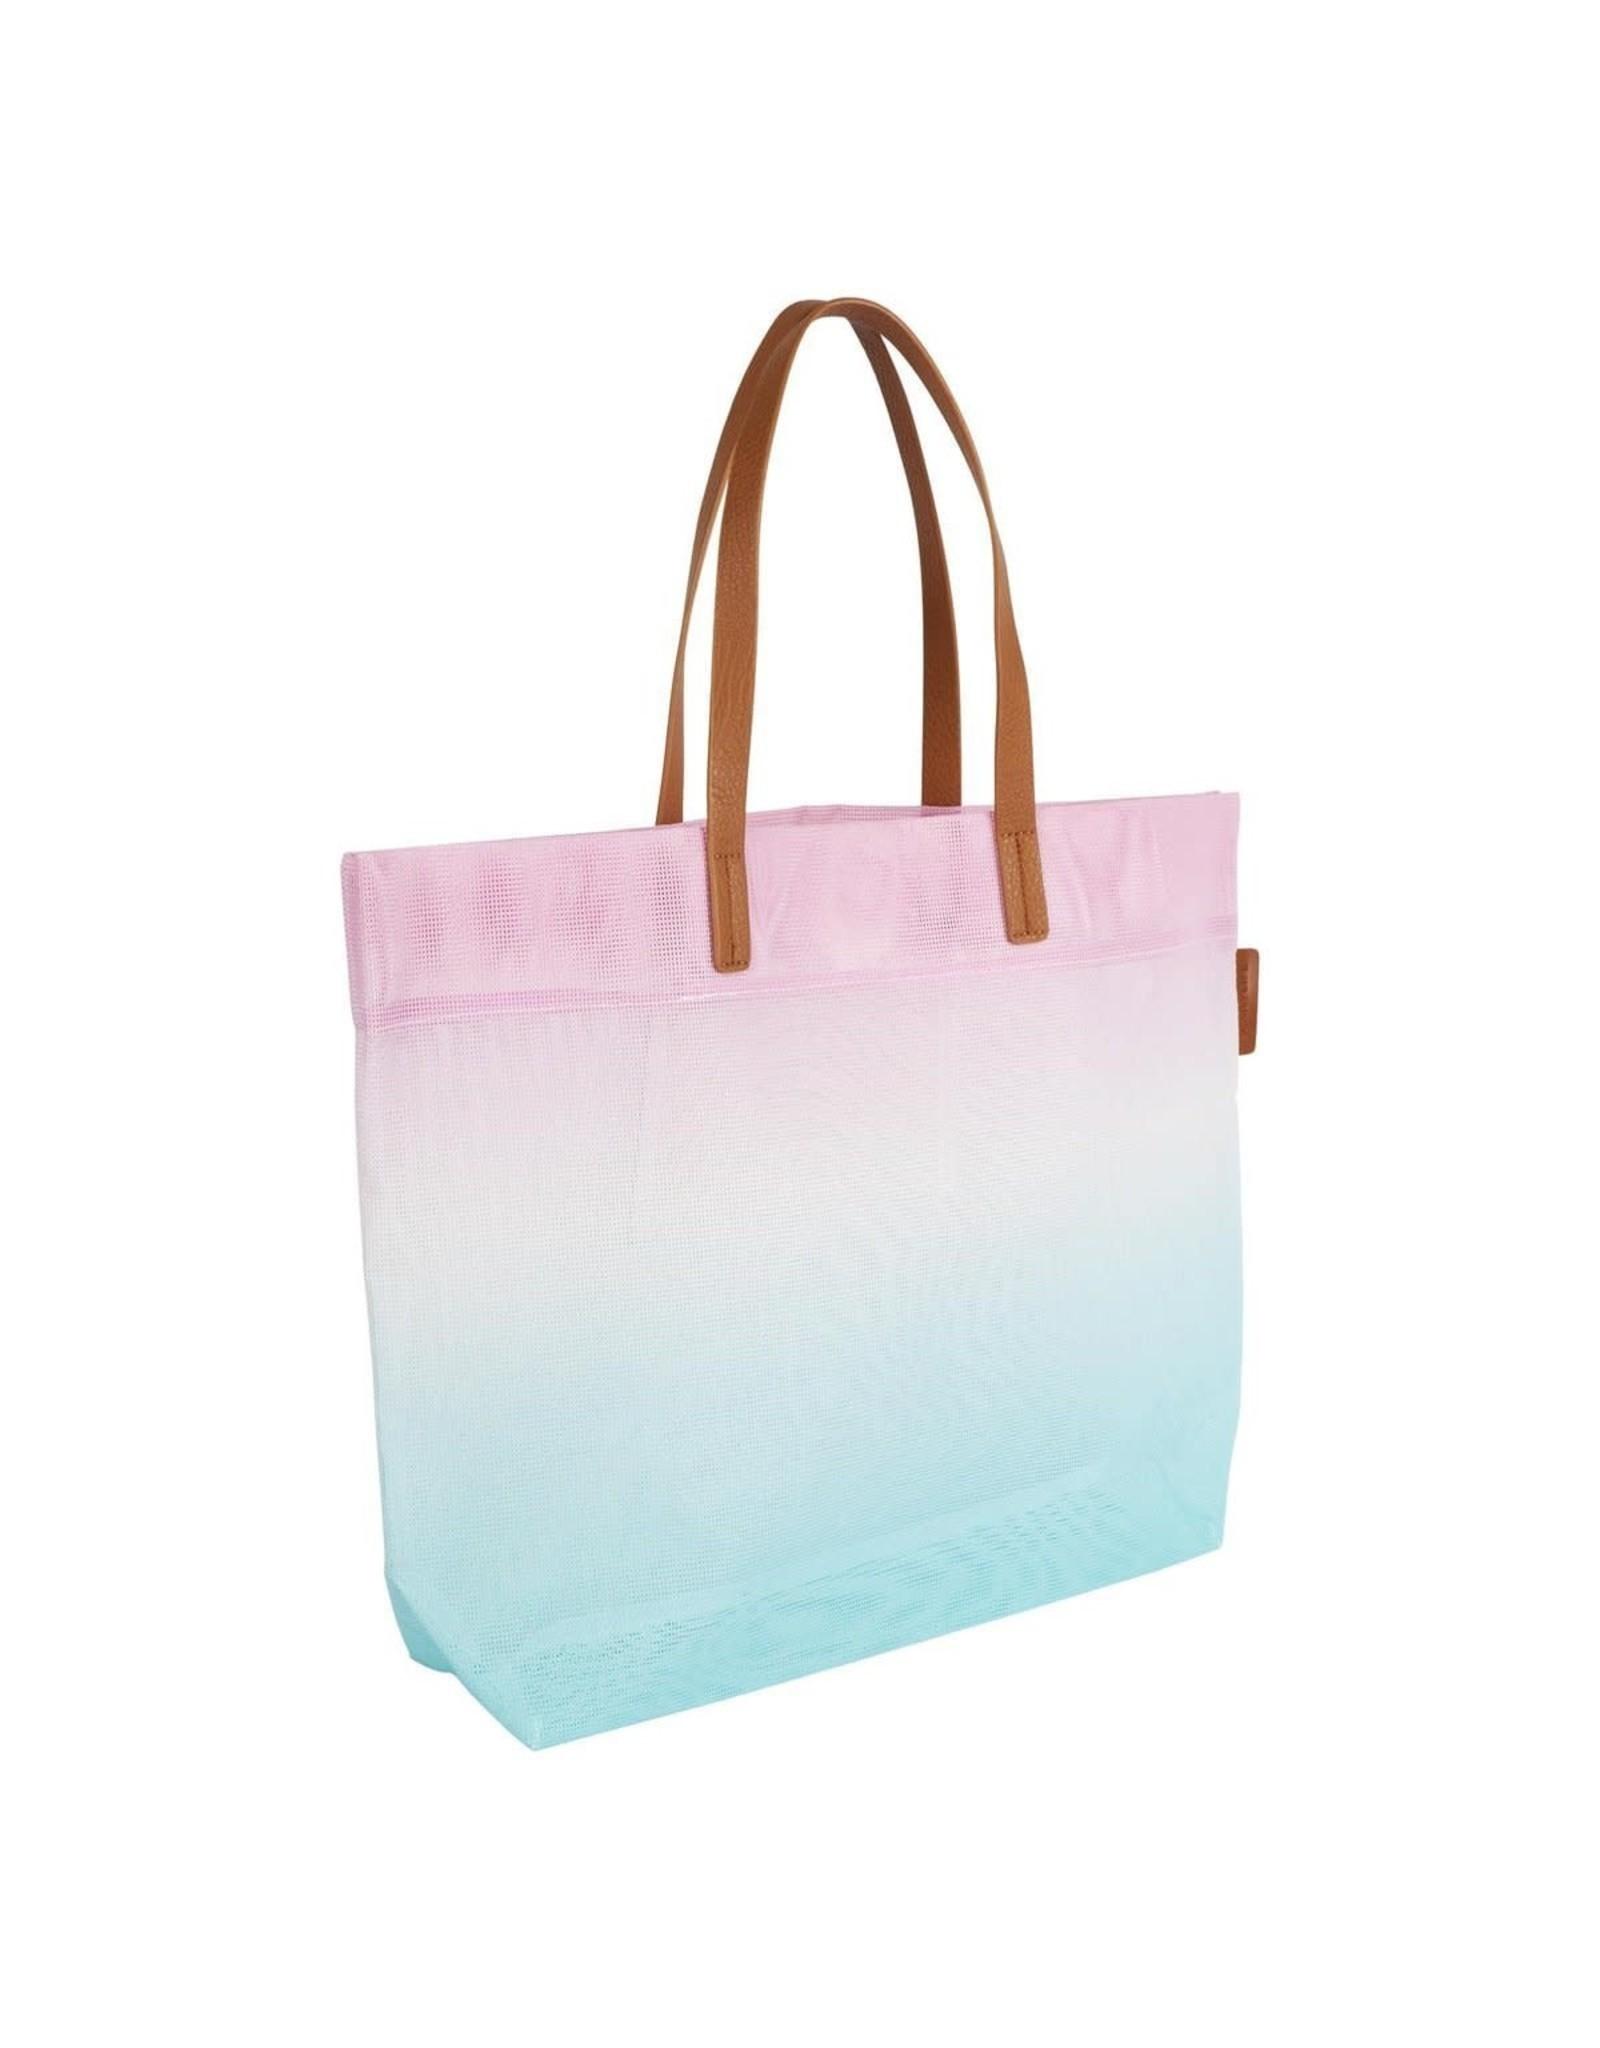 Sunnylife Malibu Mesh Beach Bag